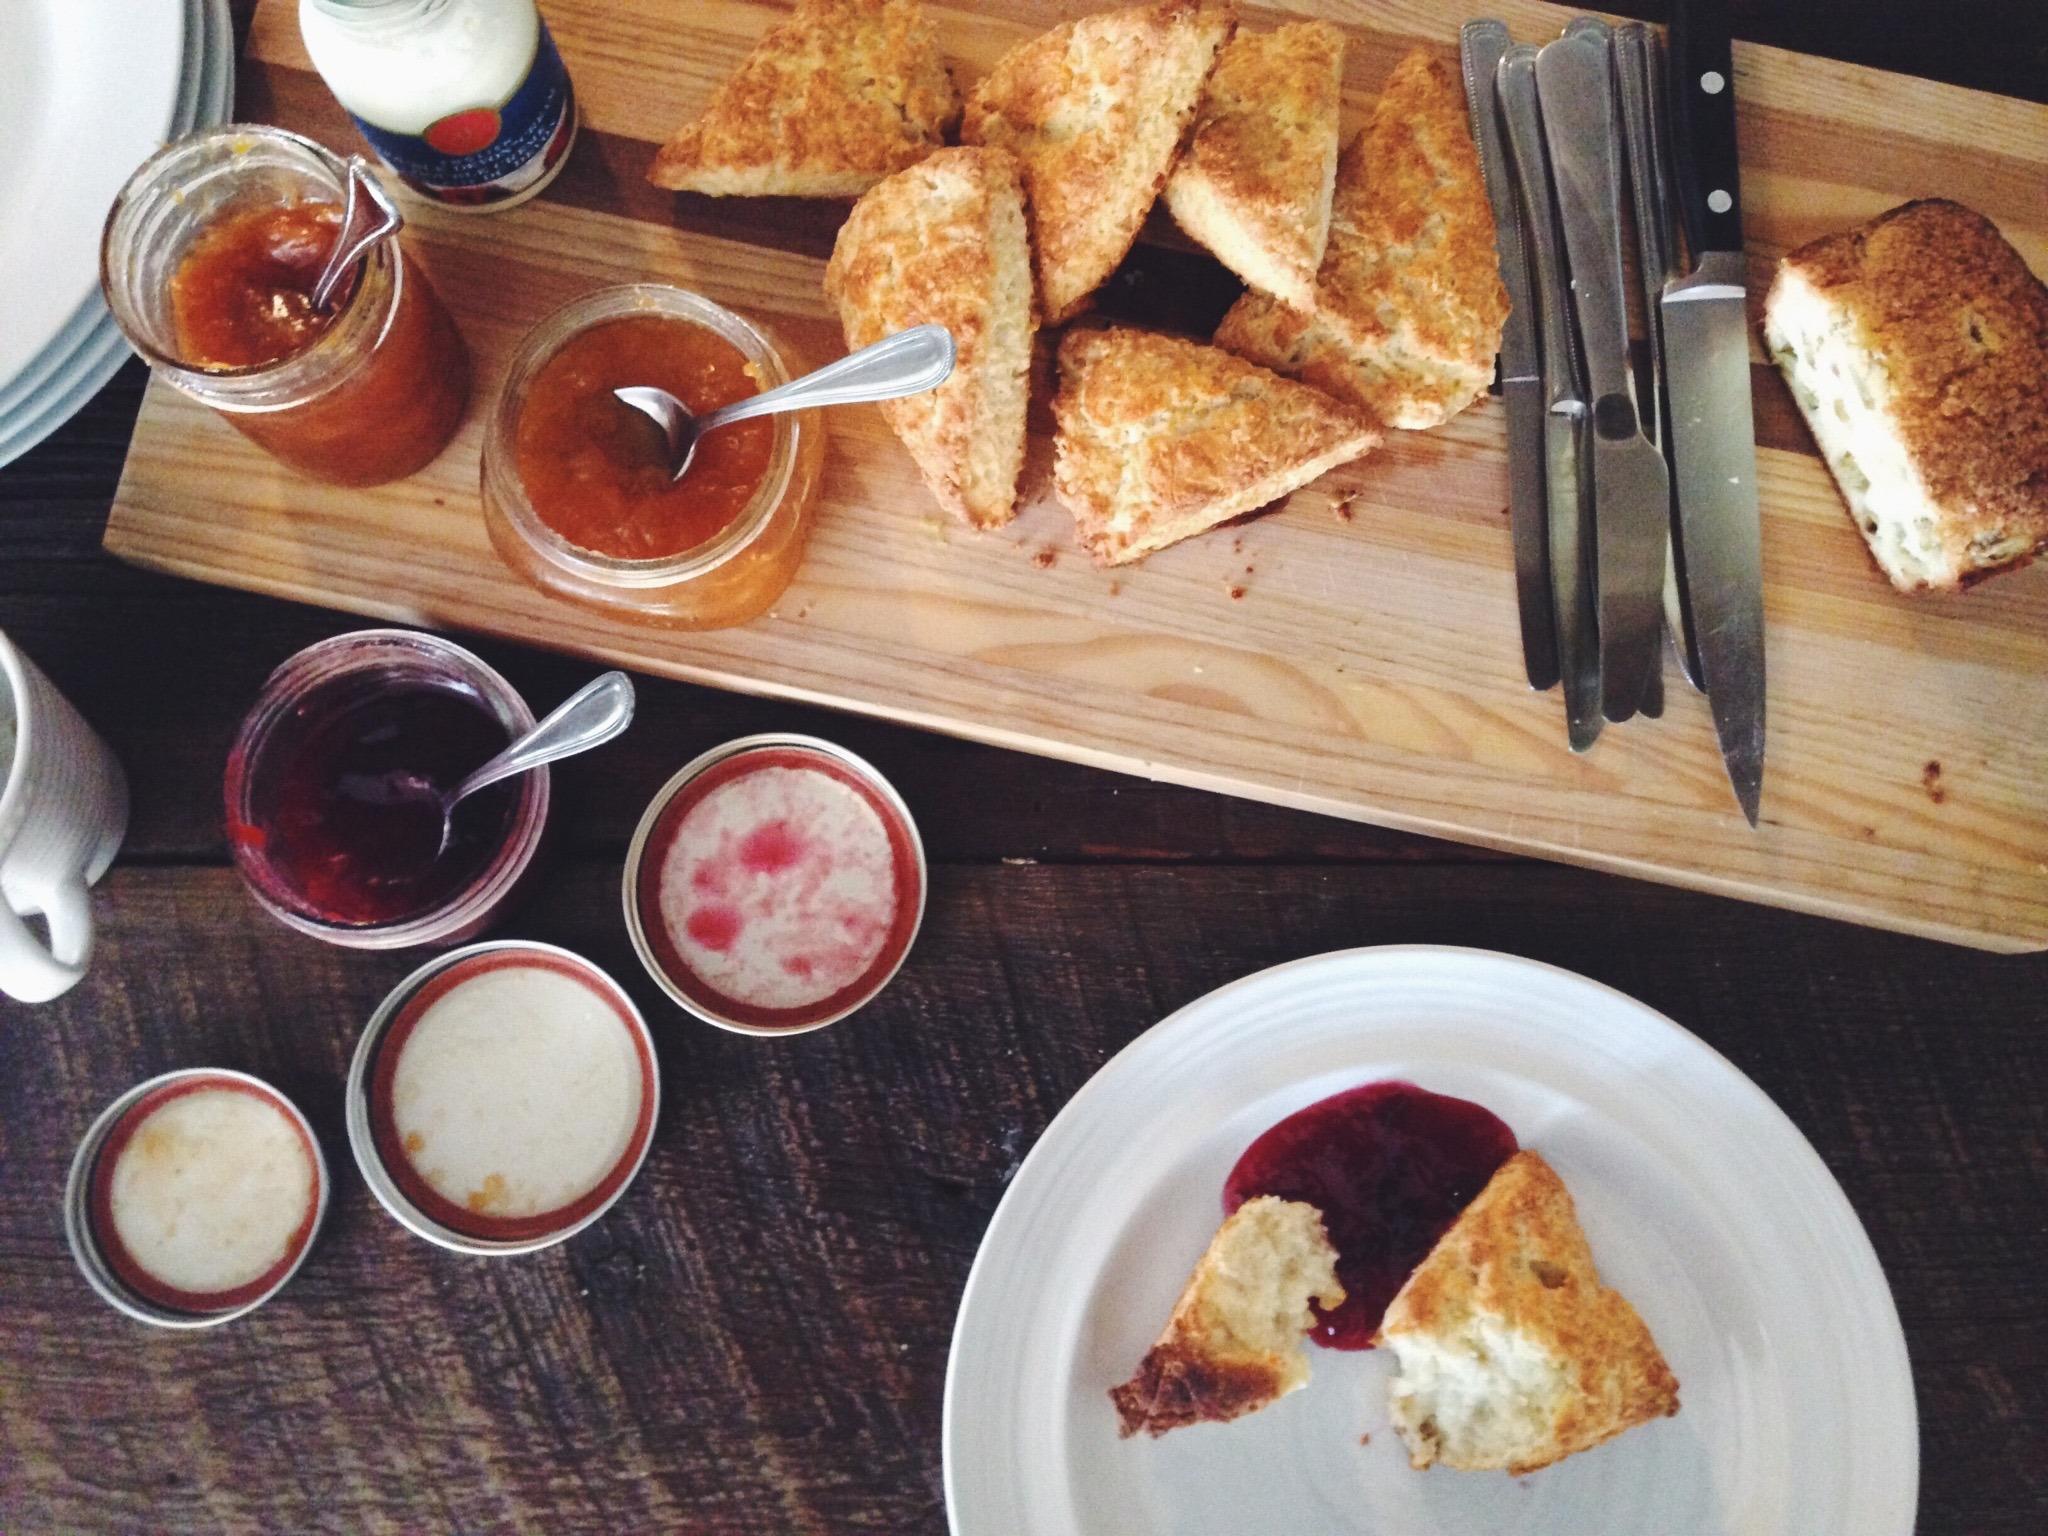 Fresh scones and homemade jams